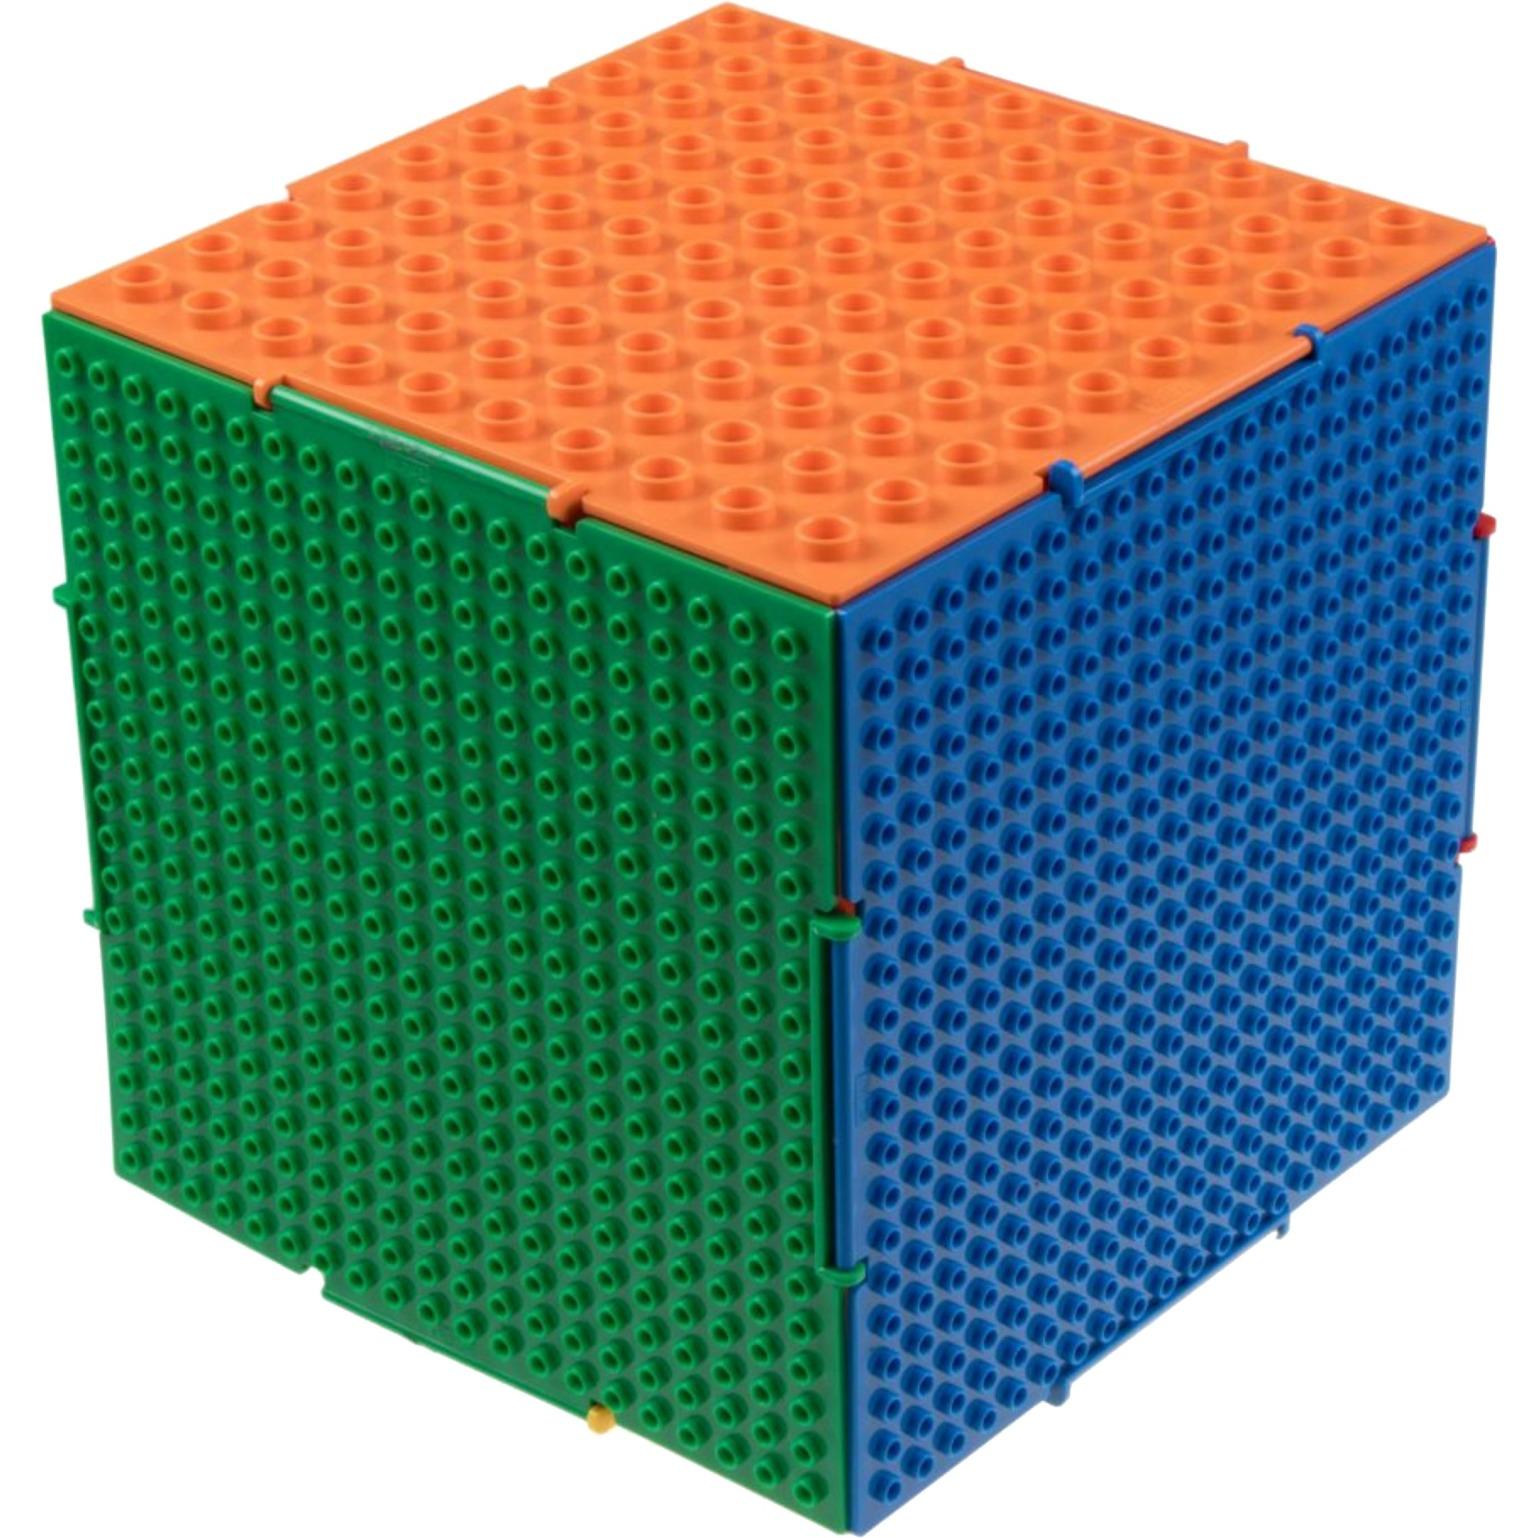 The Cube double sided Multicolour, Juegos de construcción